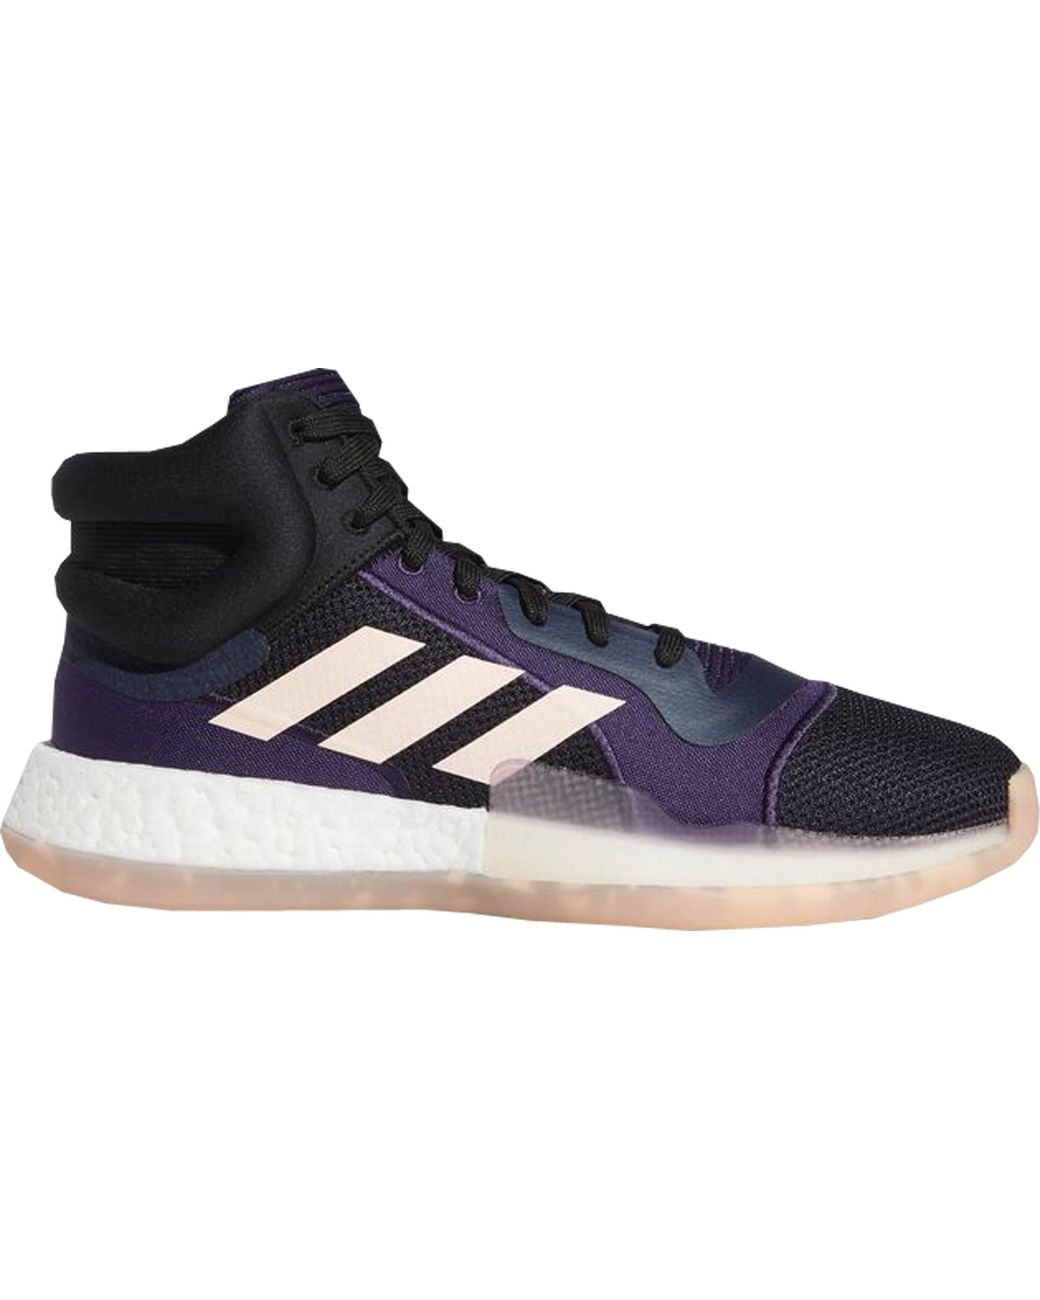 adidas boost purple